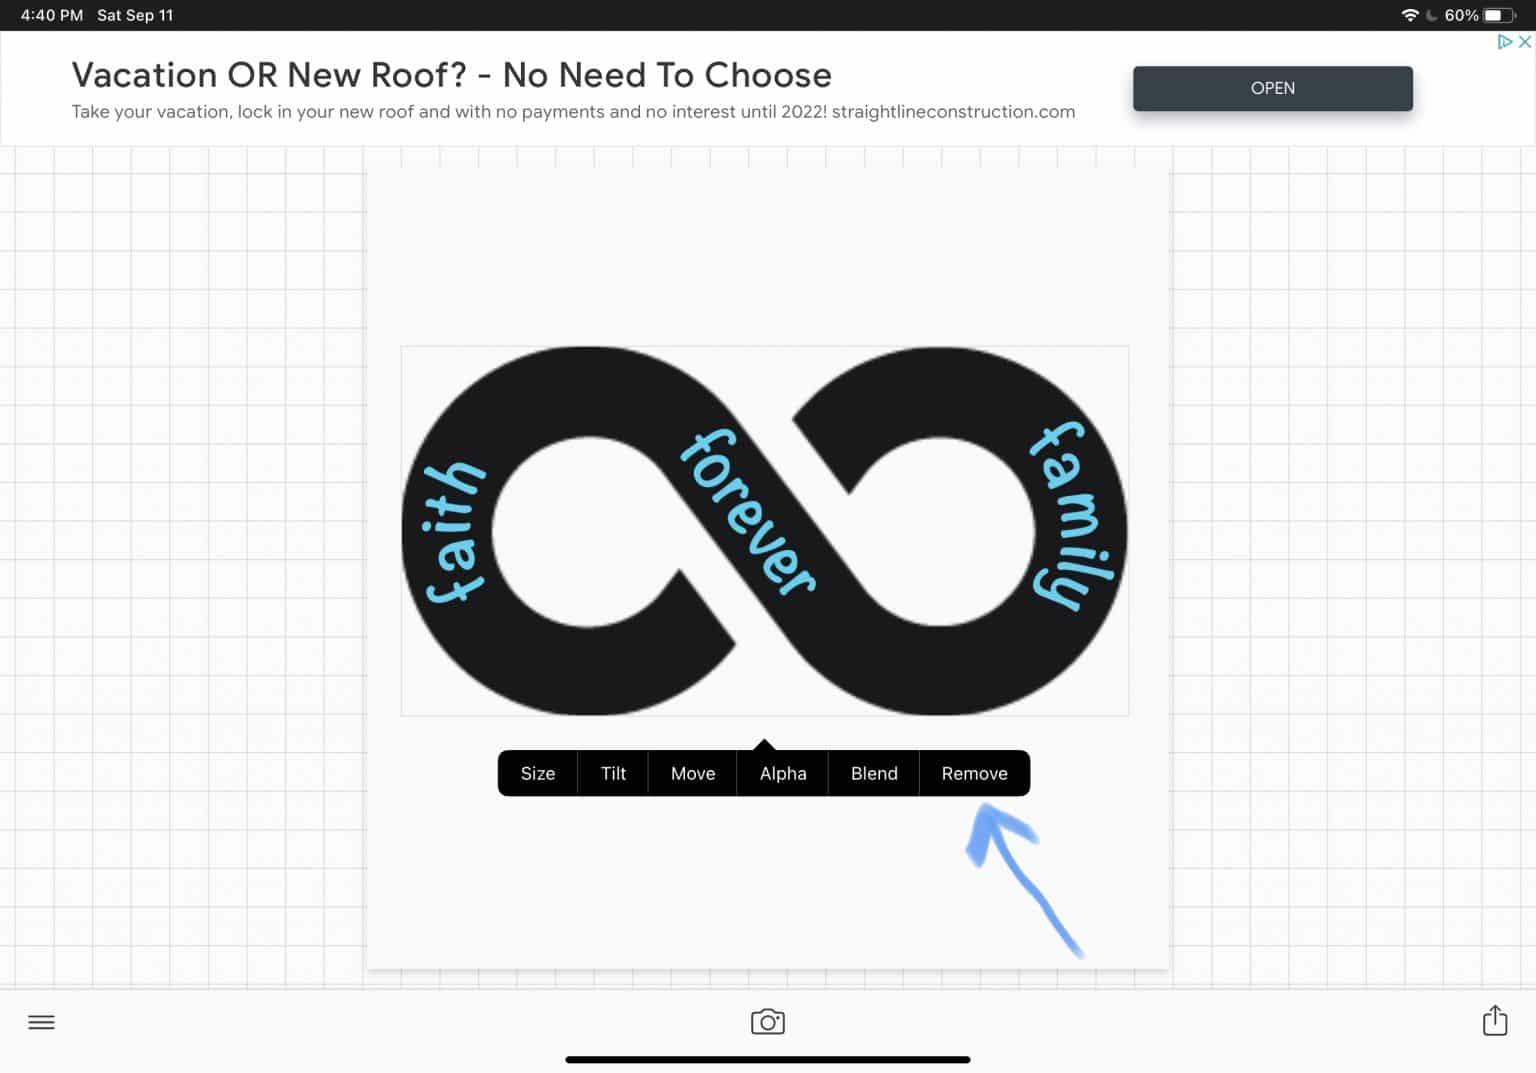 select remove to remove shape